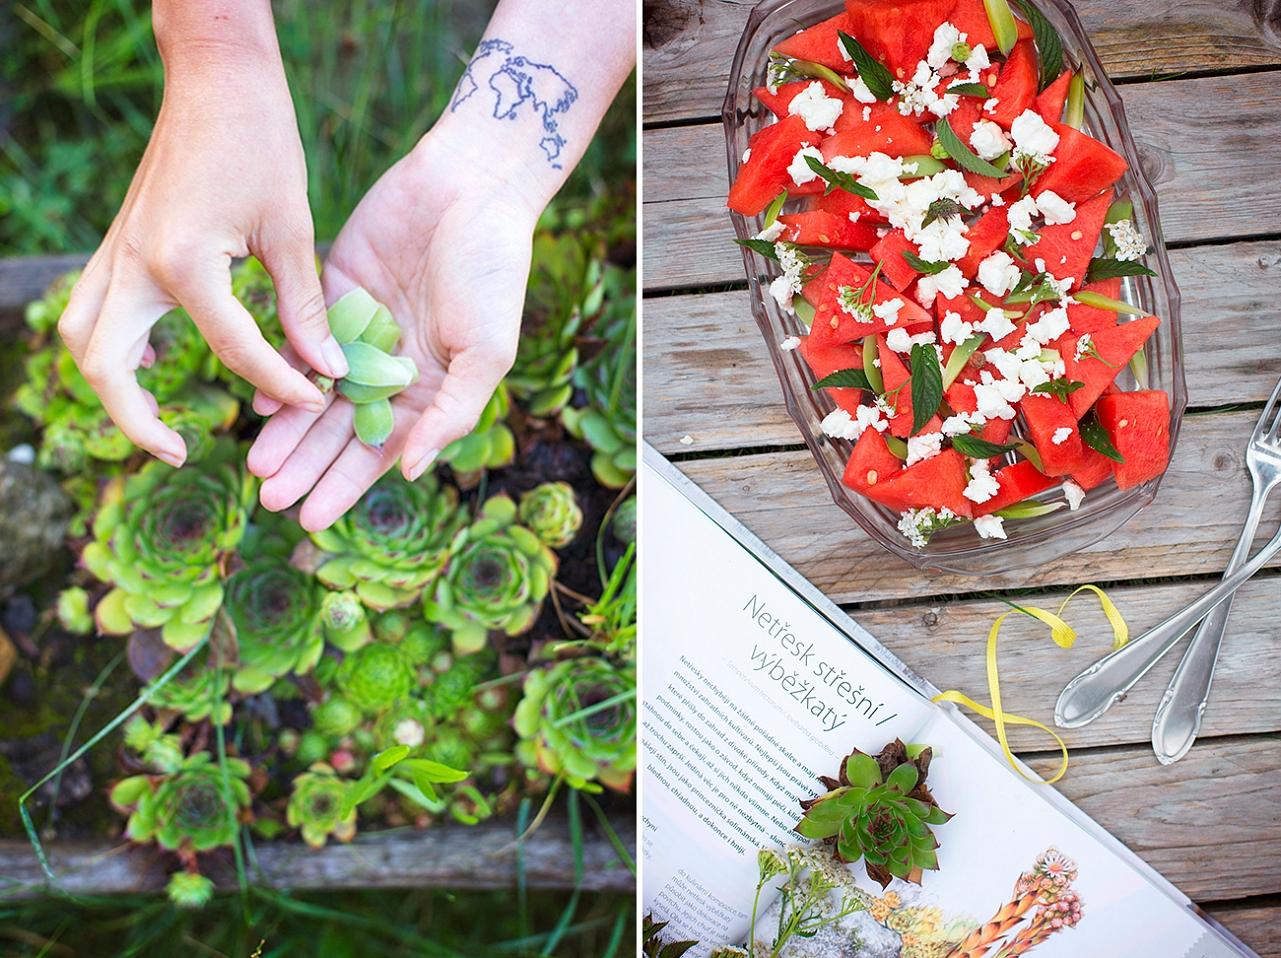 Melounový salát - feta, máta, netřesk